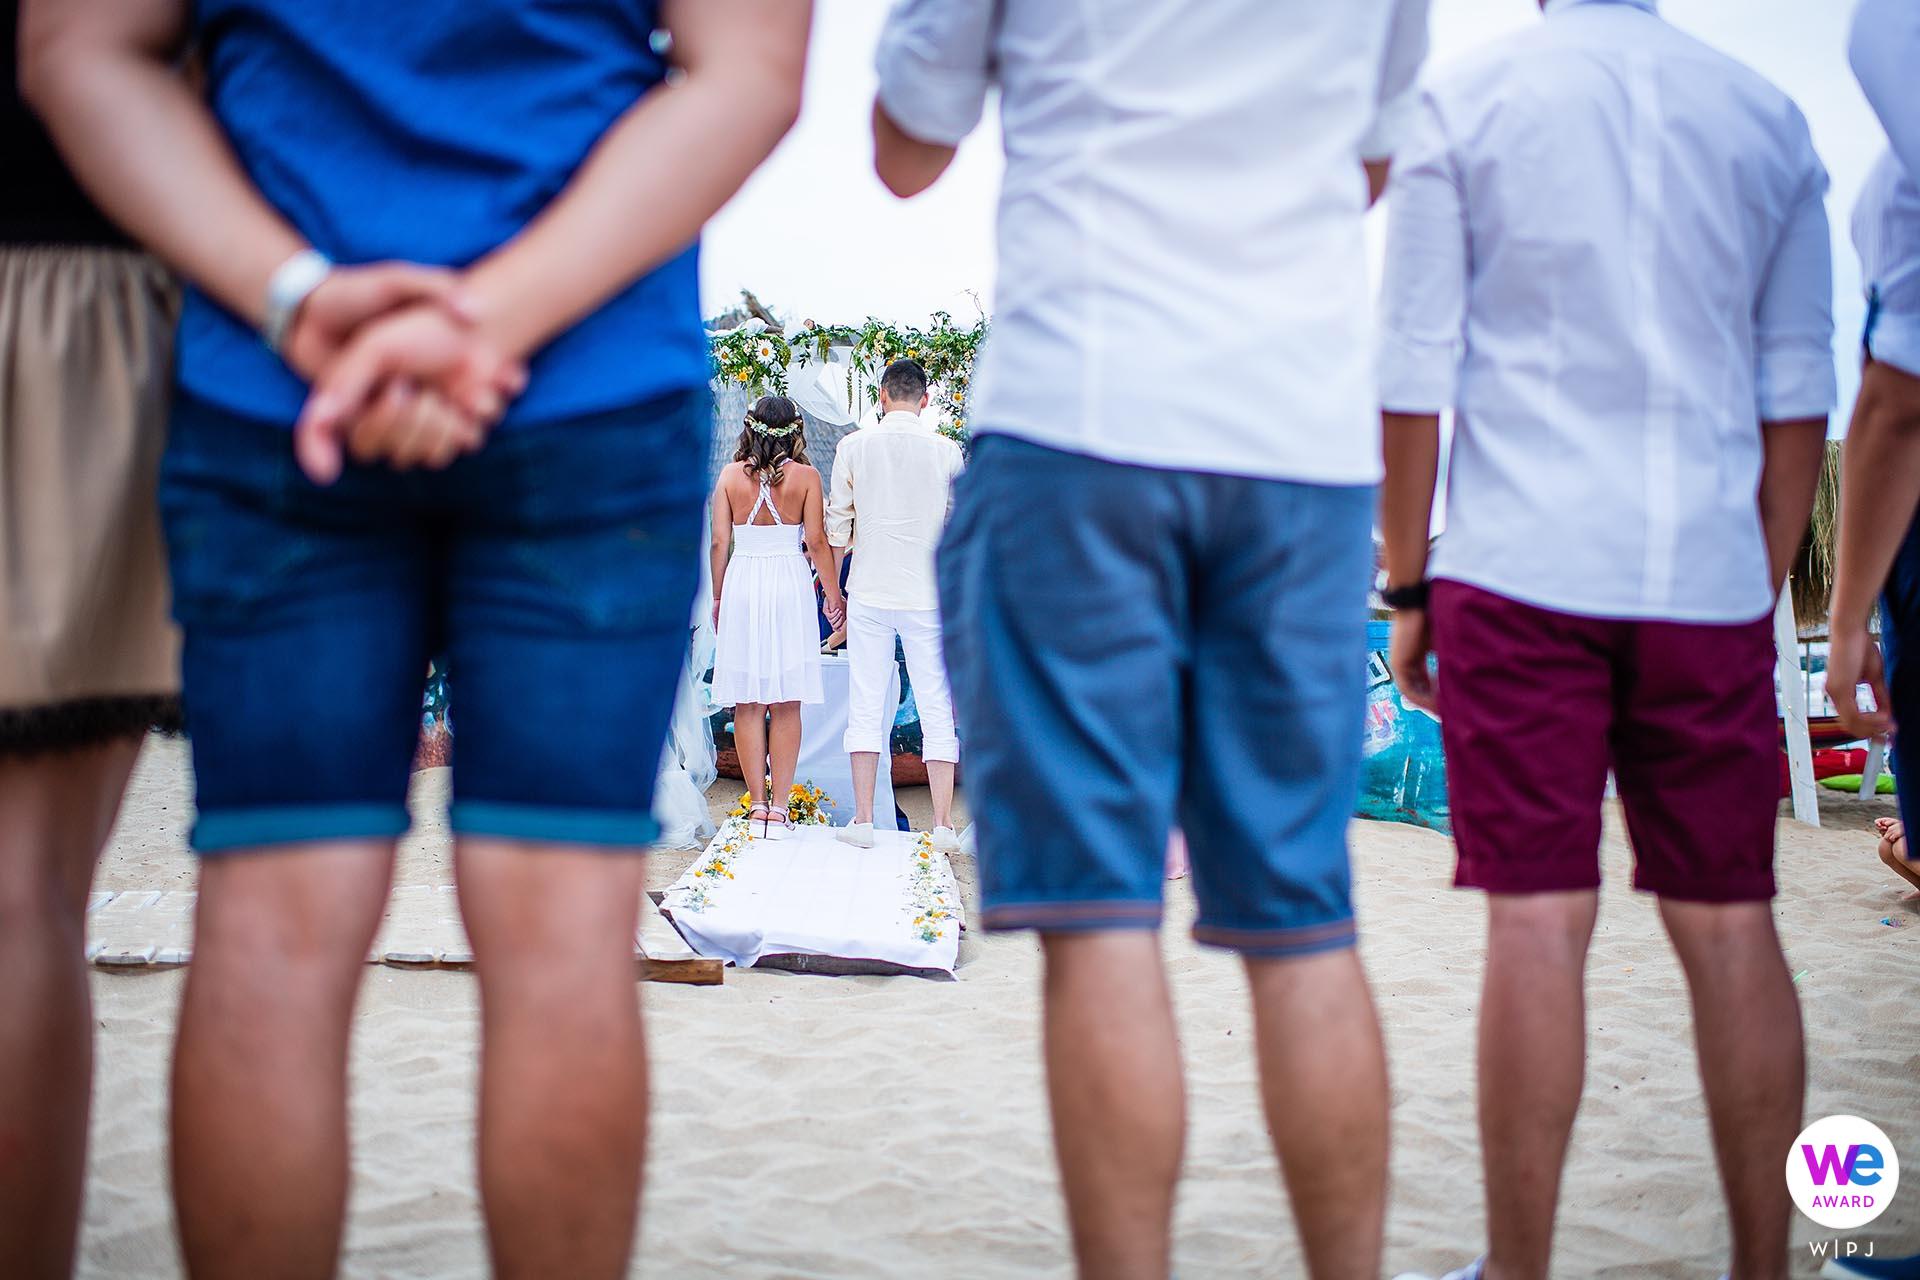 Smokinya Beach, Sozopol, Bulgaria Elopement Photography Story | a fun, low-key beach party at Smokinya Beach